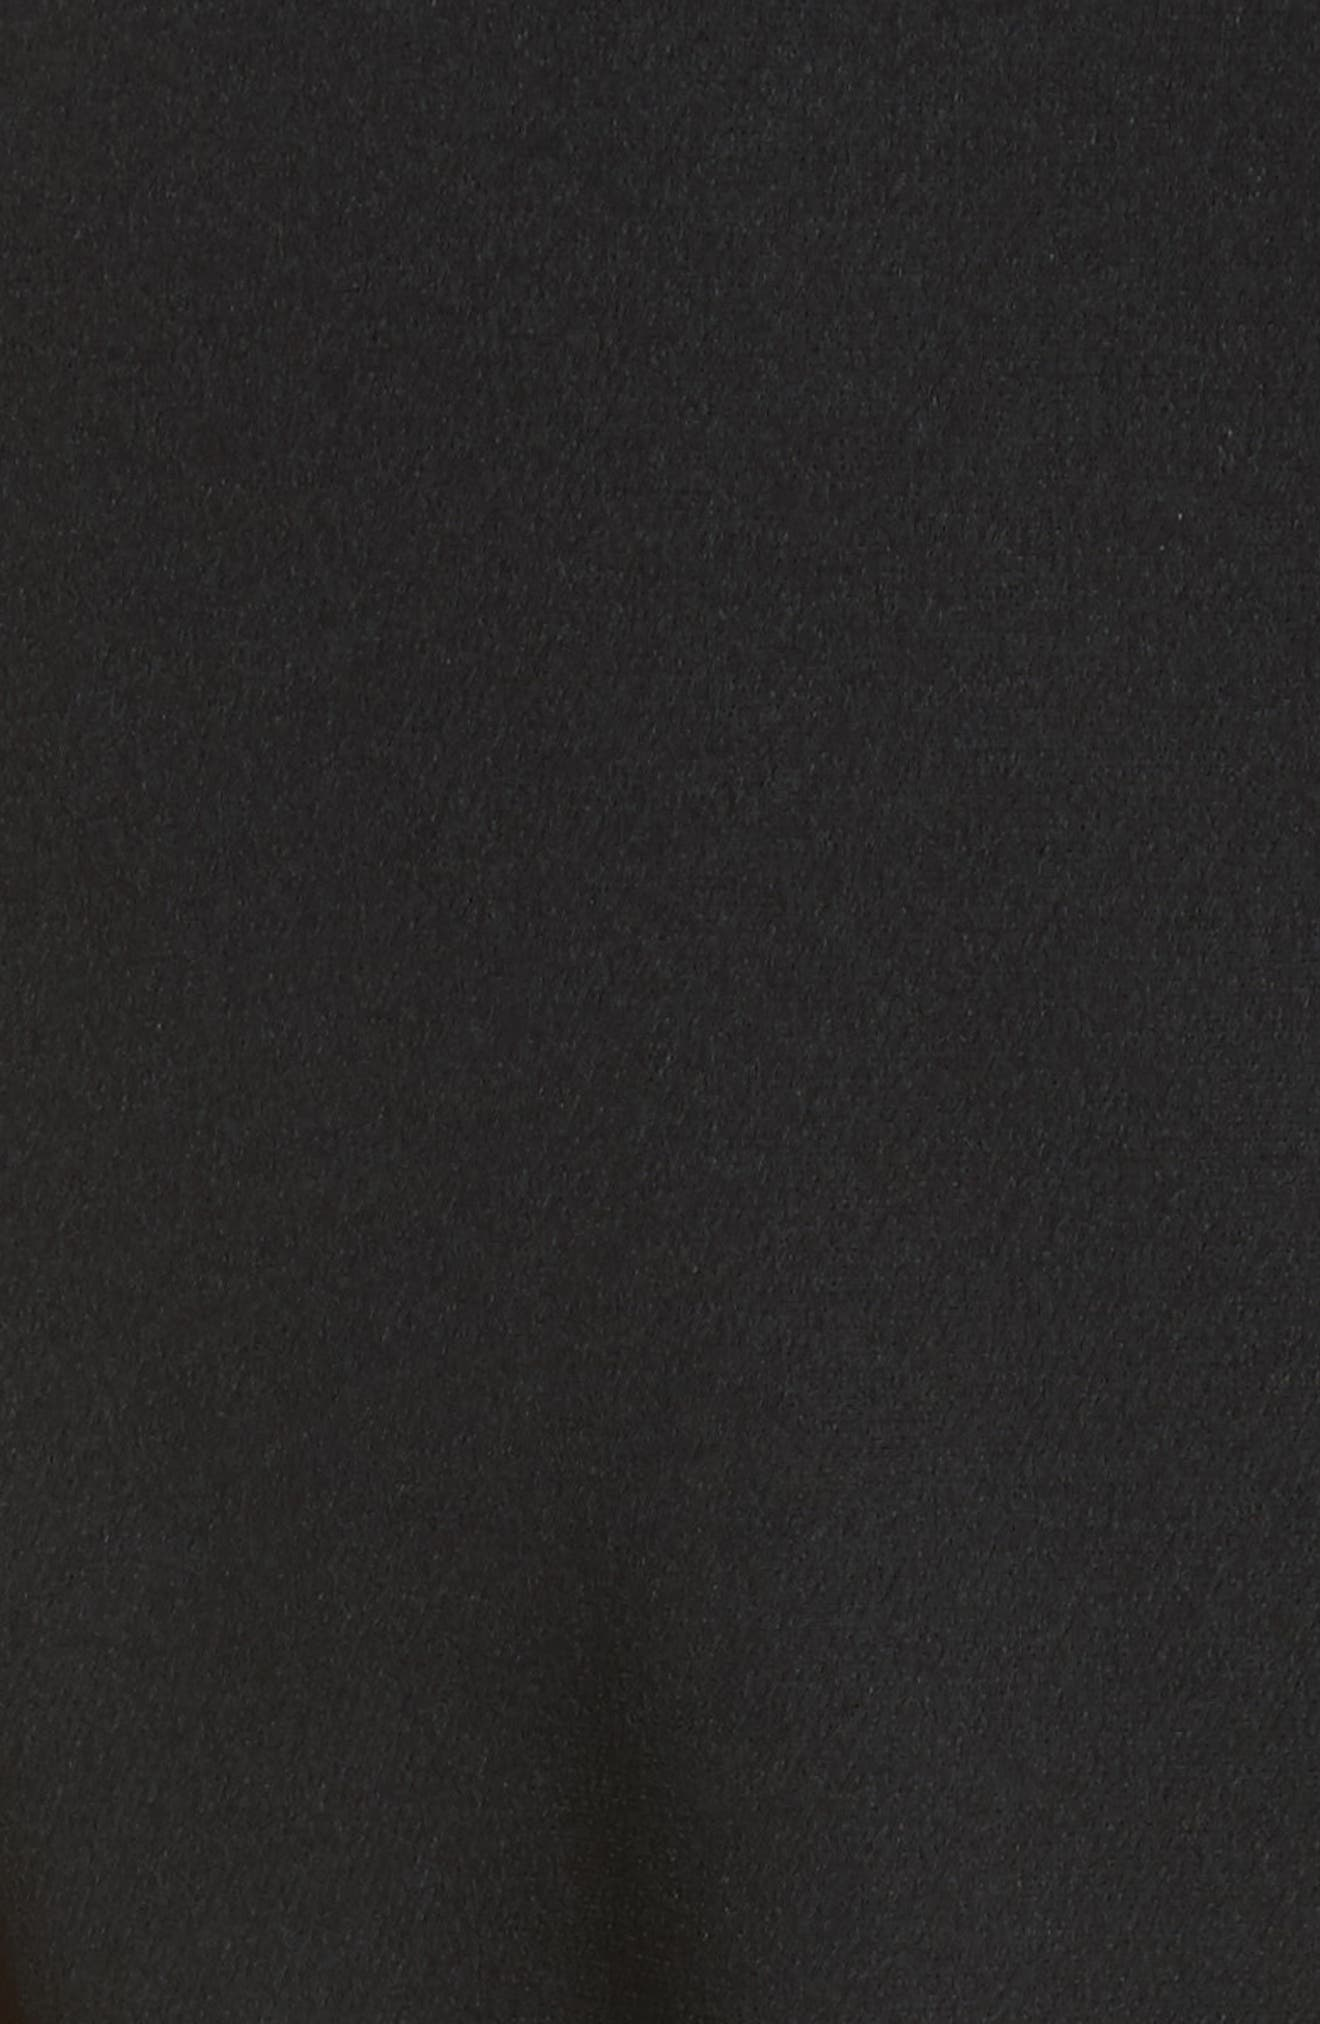 Jenny Stretch Crepe Fit & Flare Dress,                             Alternate thumbnail 5, color,